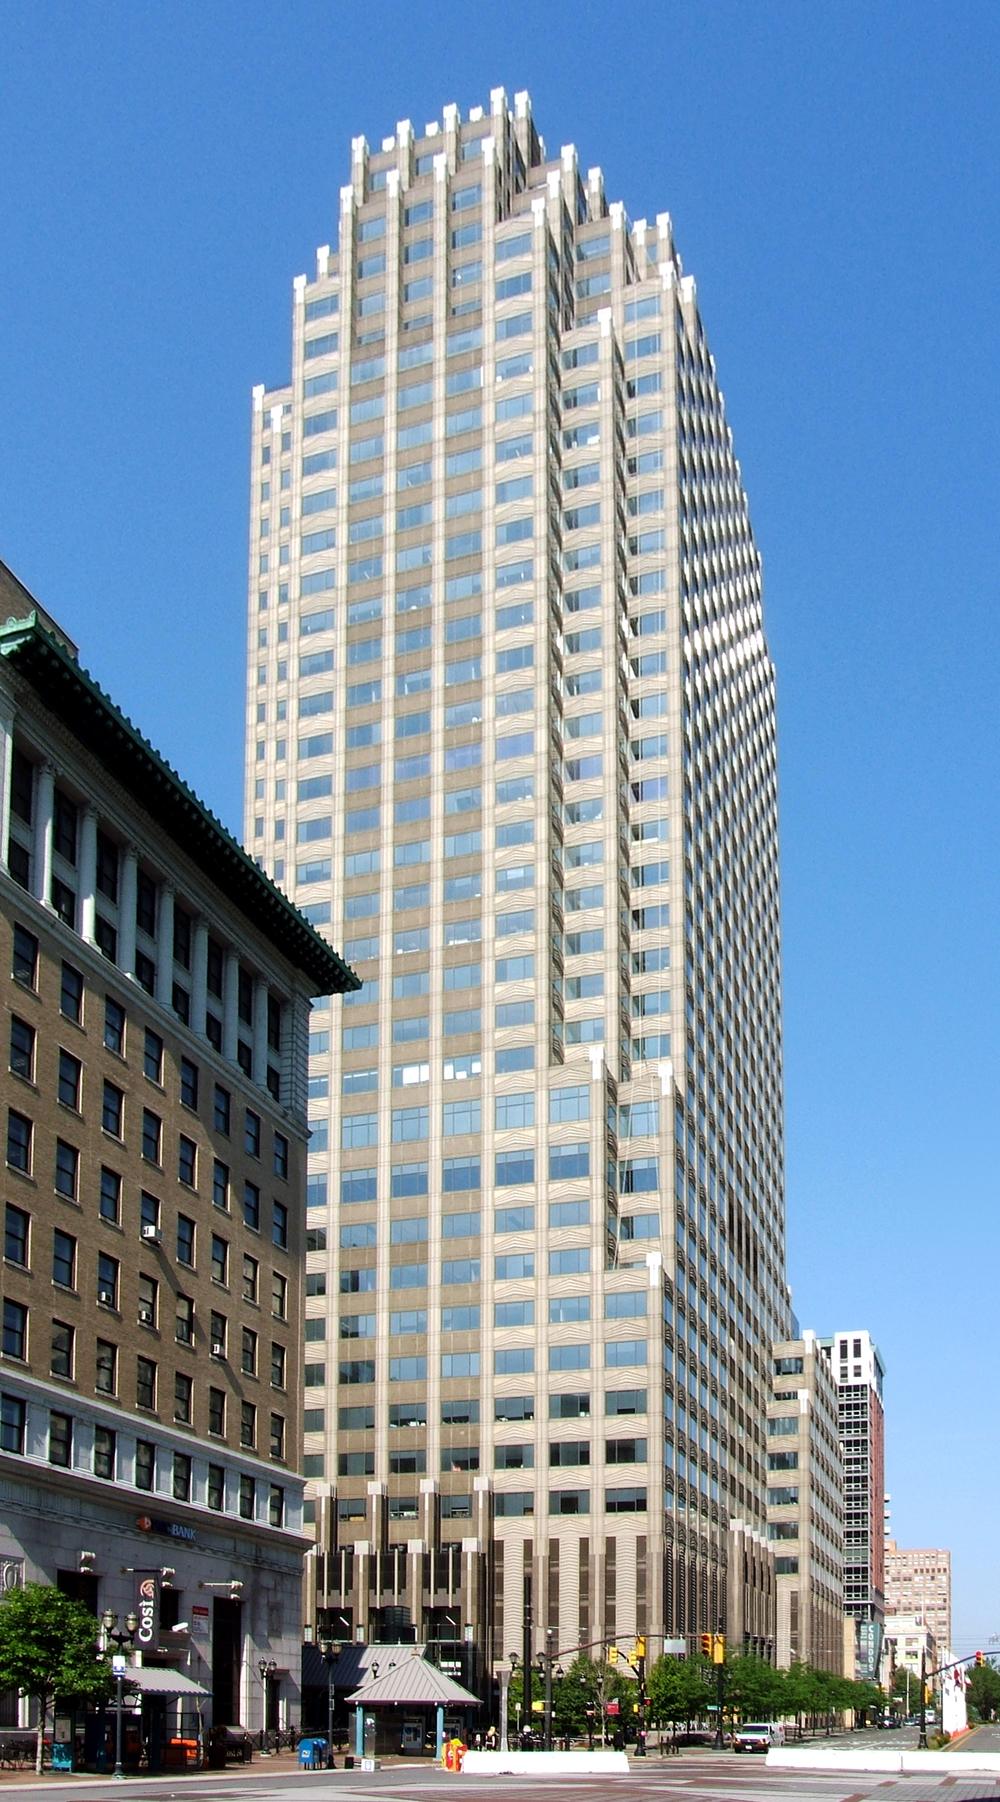 101 Hudson Street The Skyscraper Center